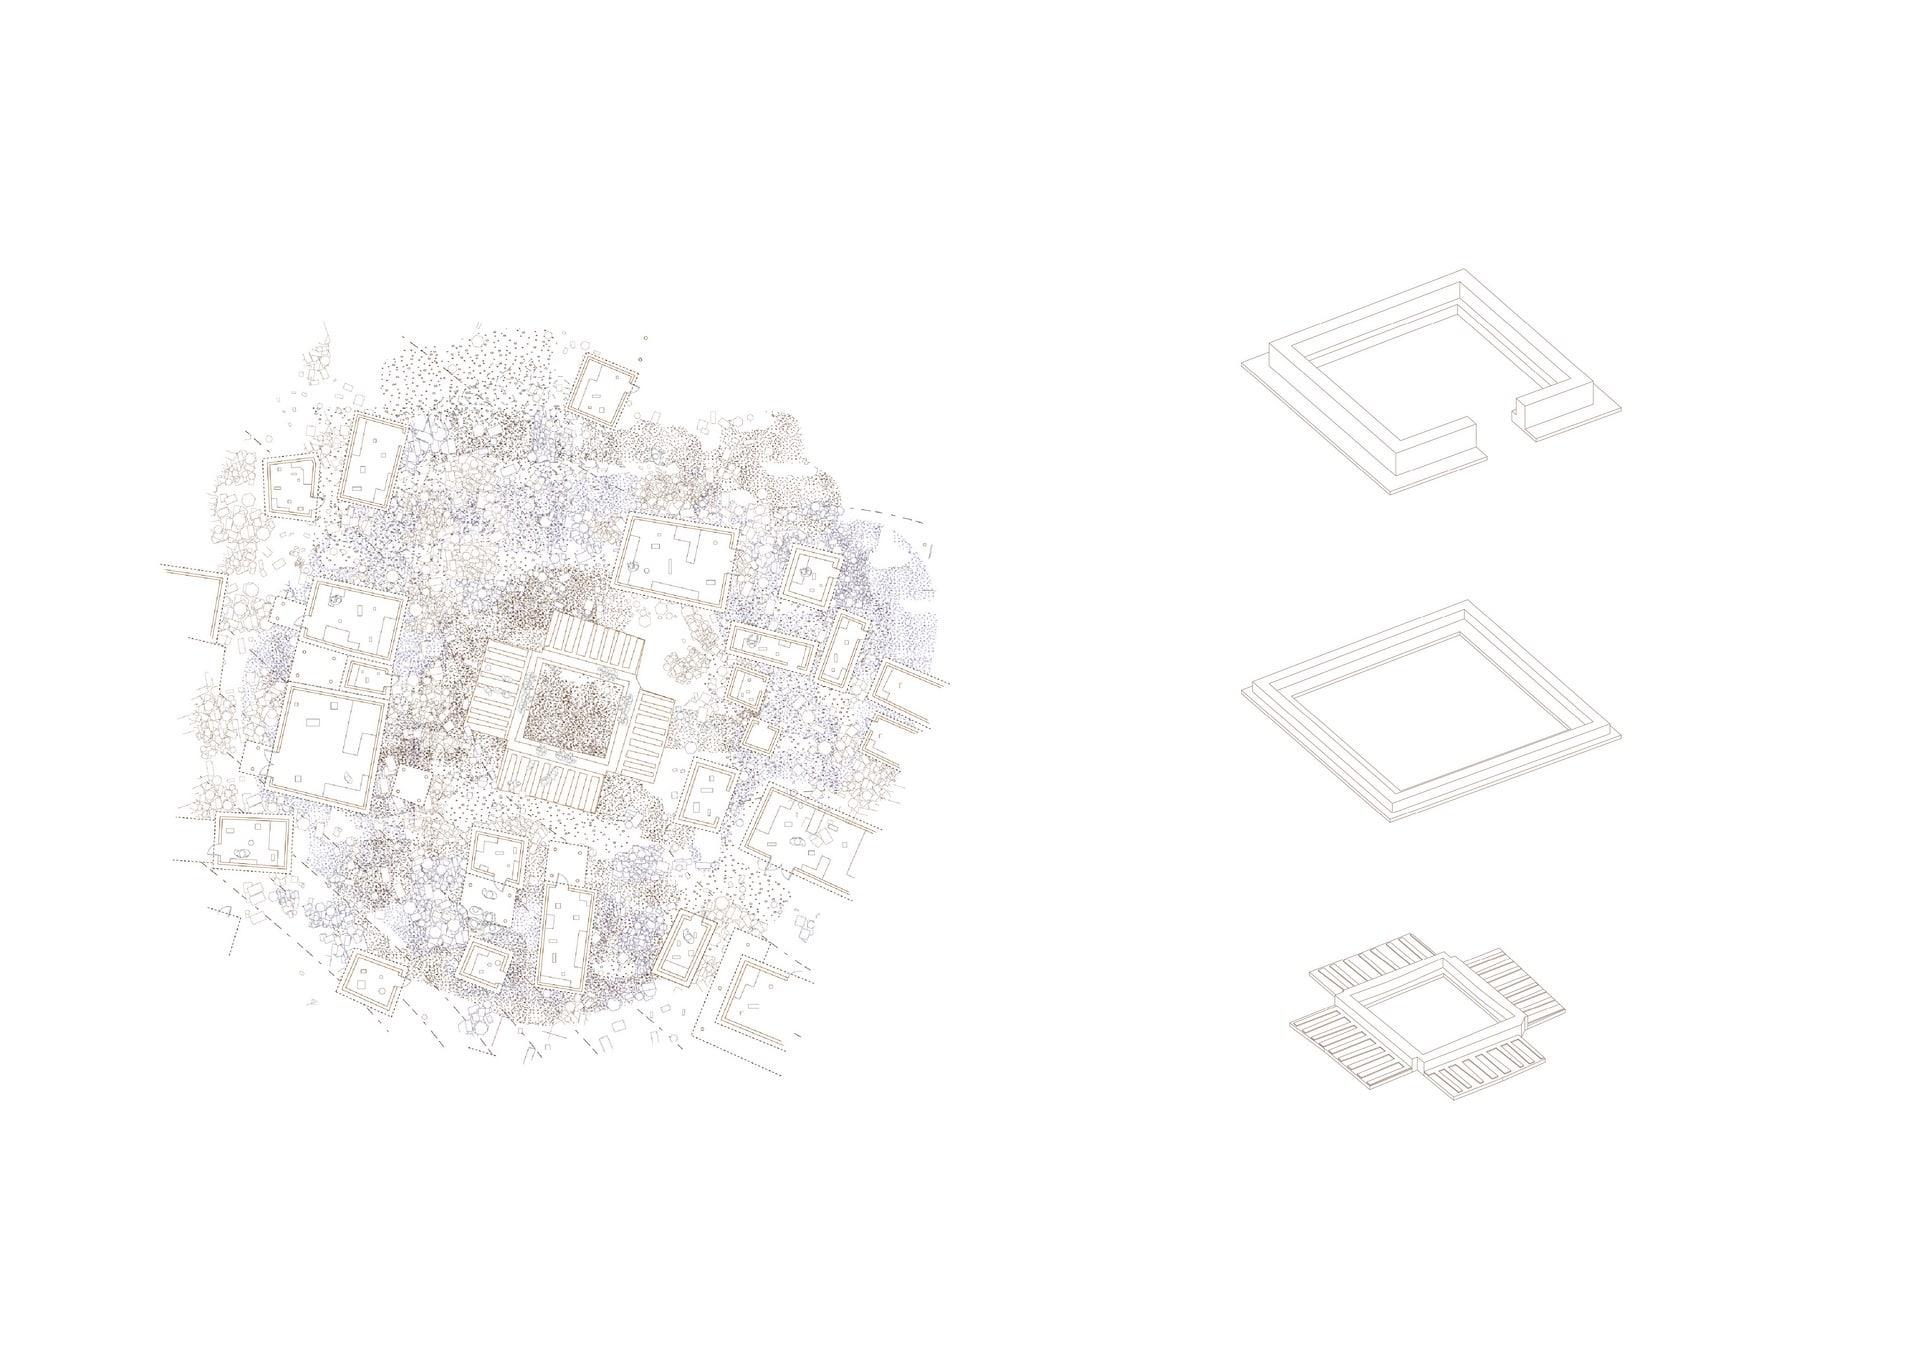 Frame Plinth Development – Development of form